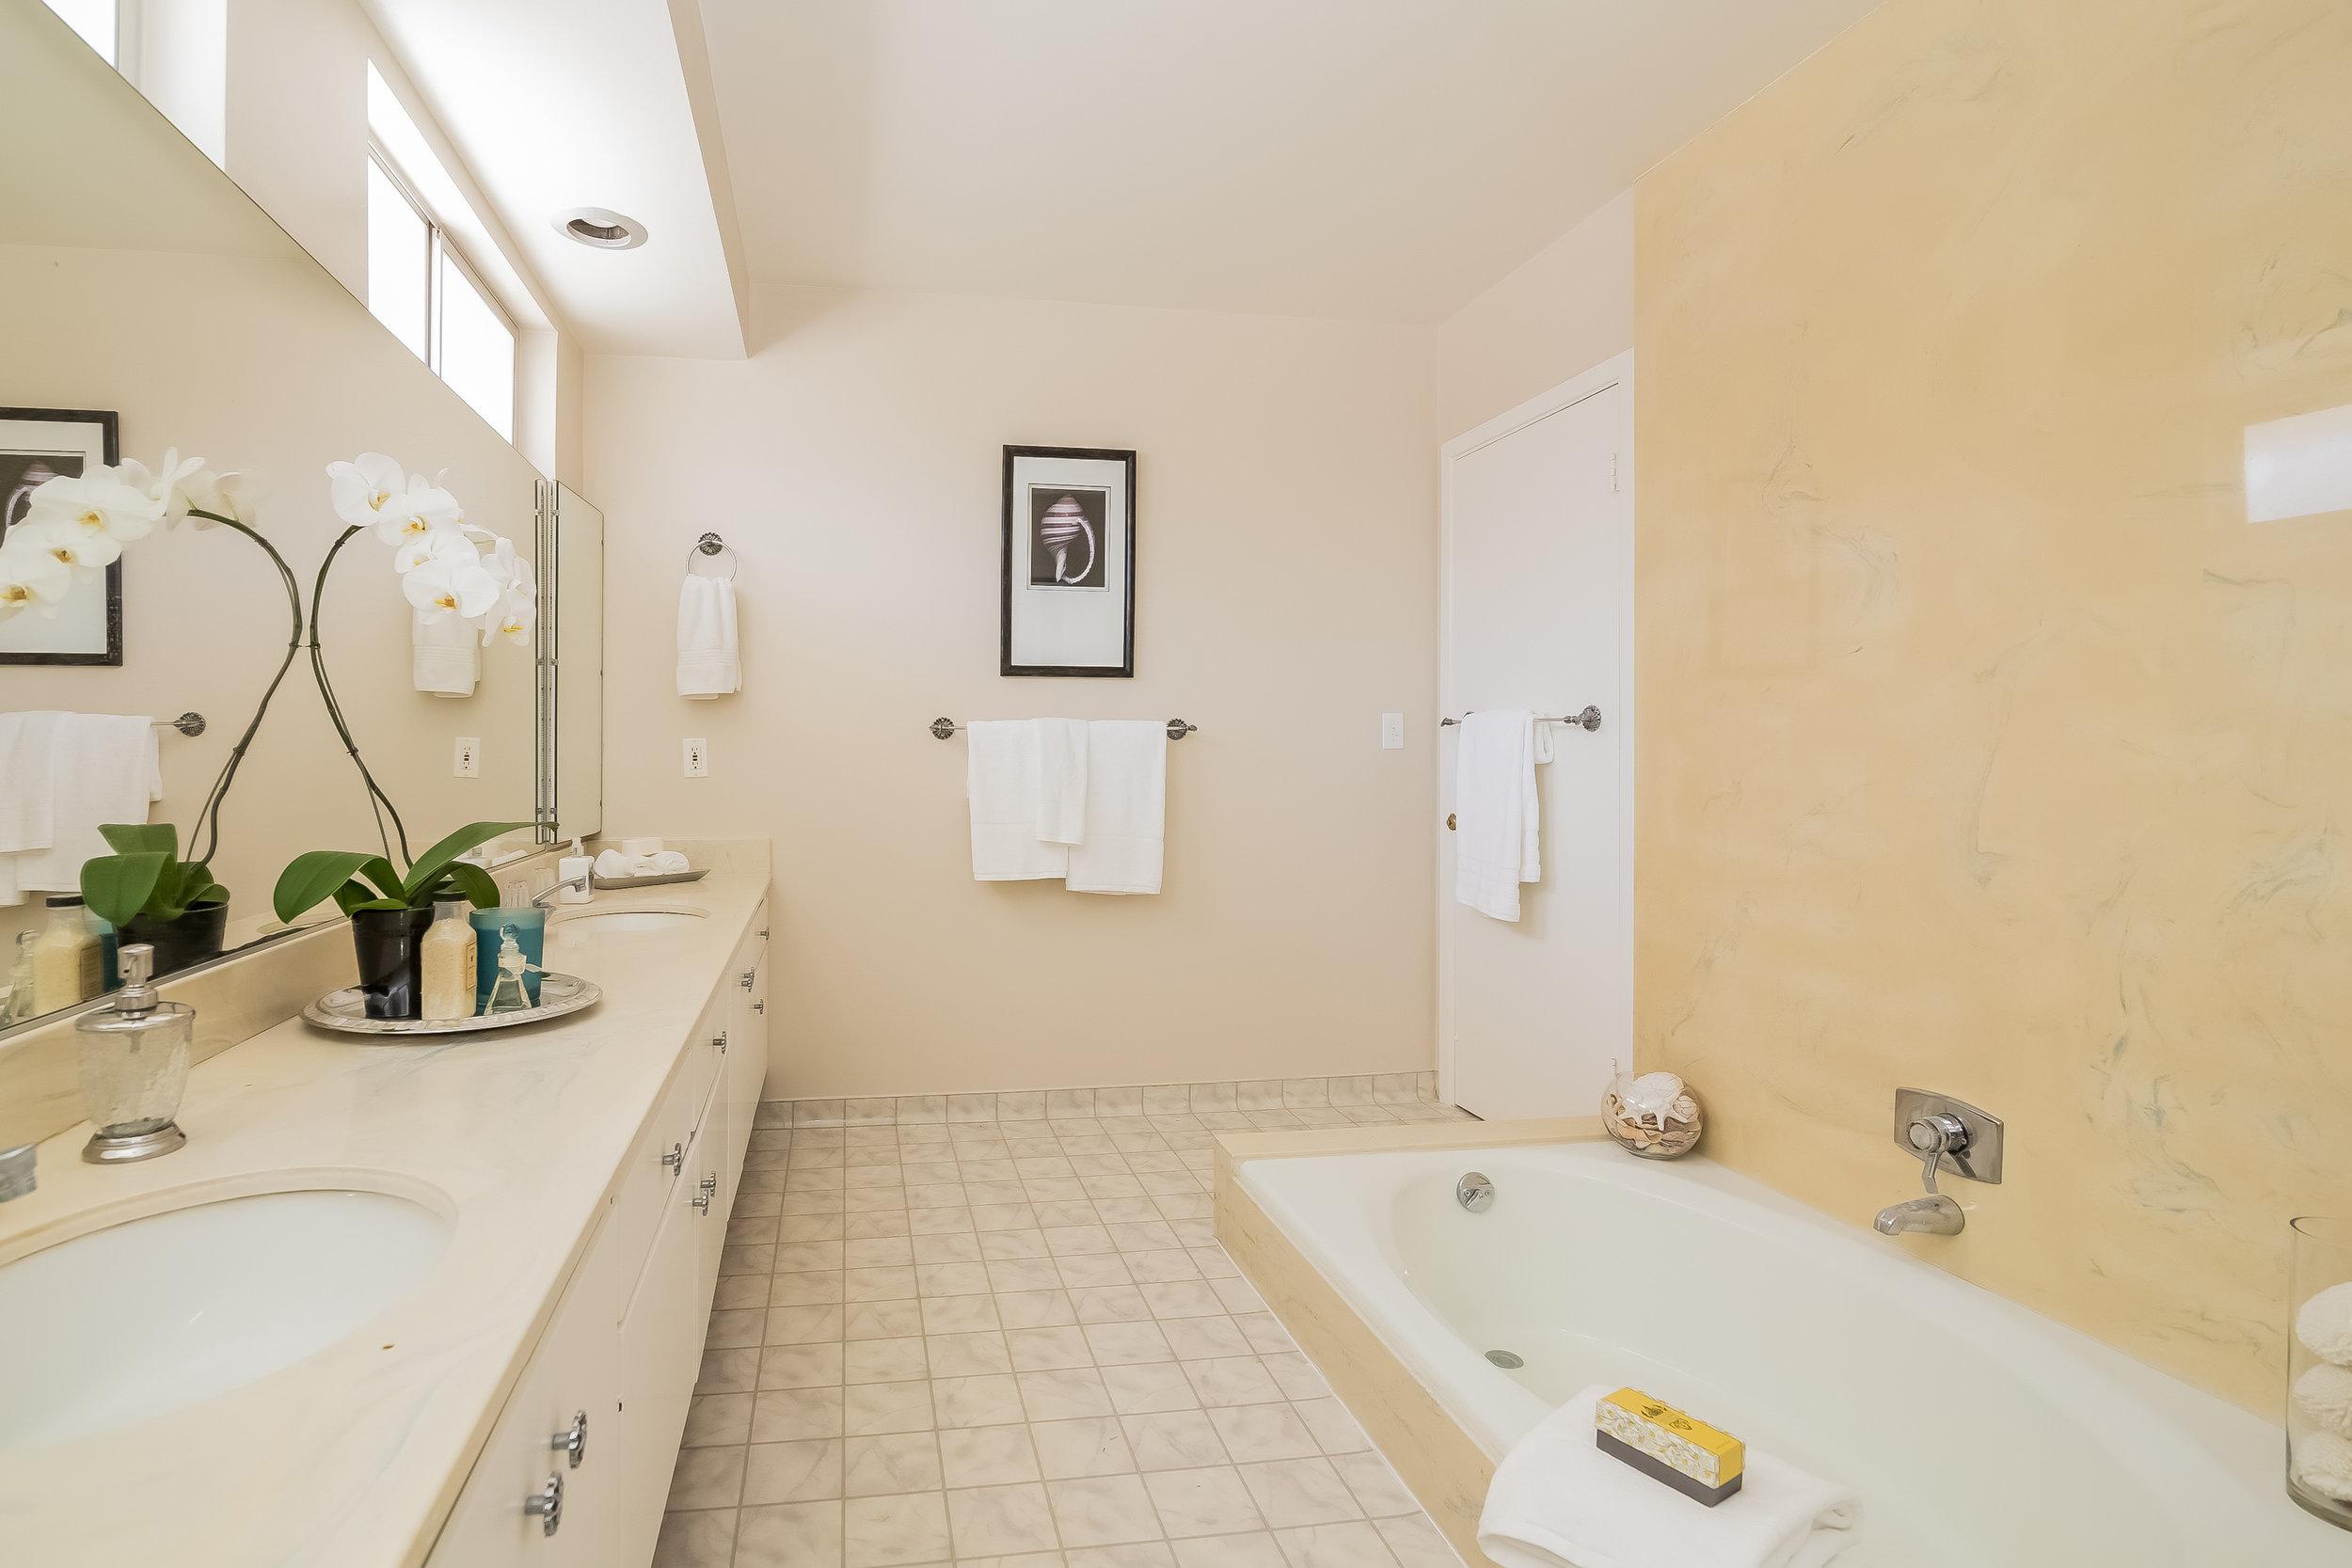 027-Master_Bathroom-2805394-large copy.jpg